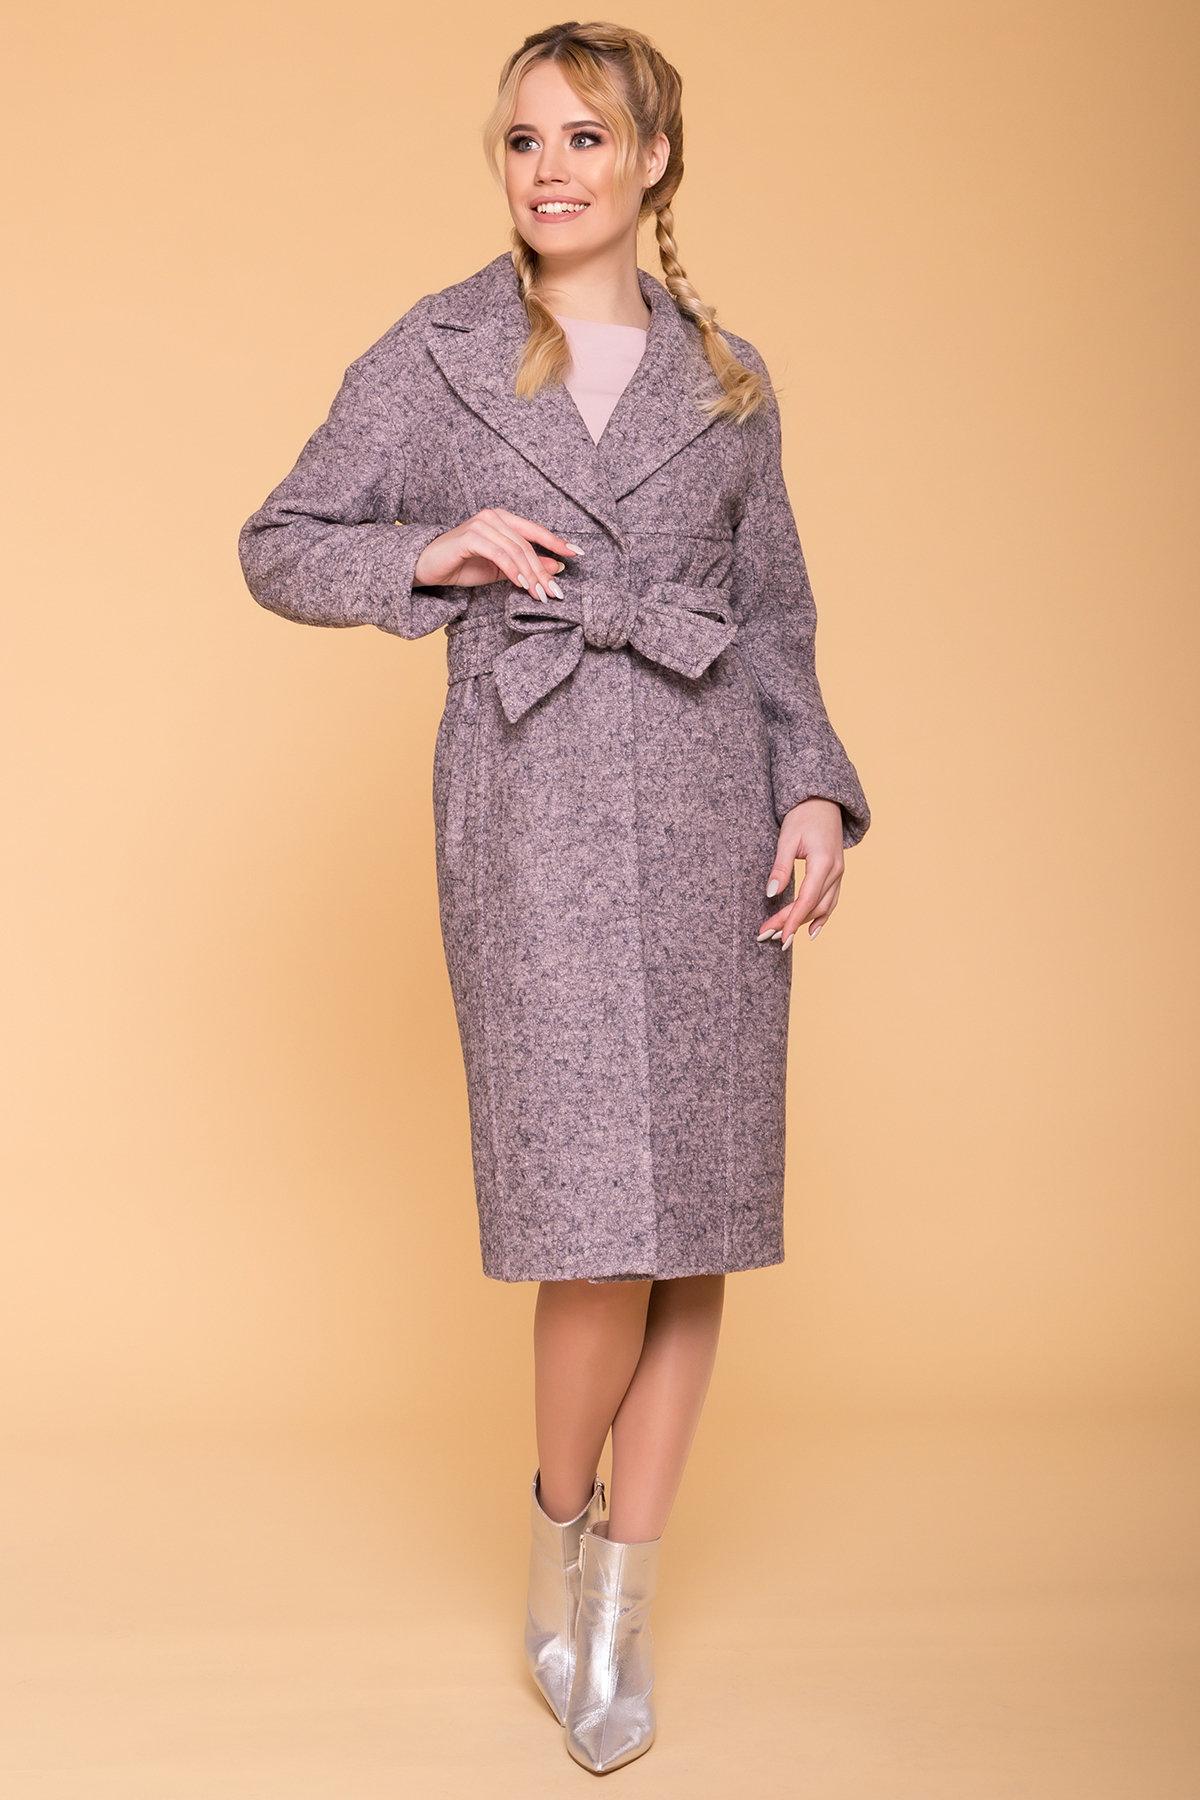 926dbe82321 Купить пальто демисезонное